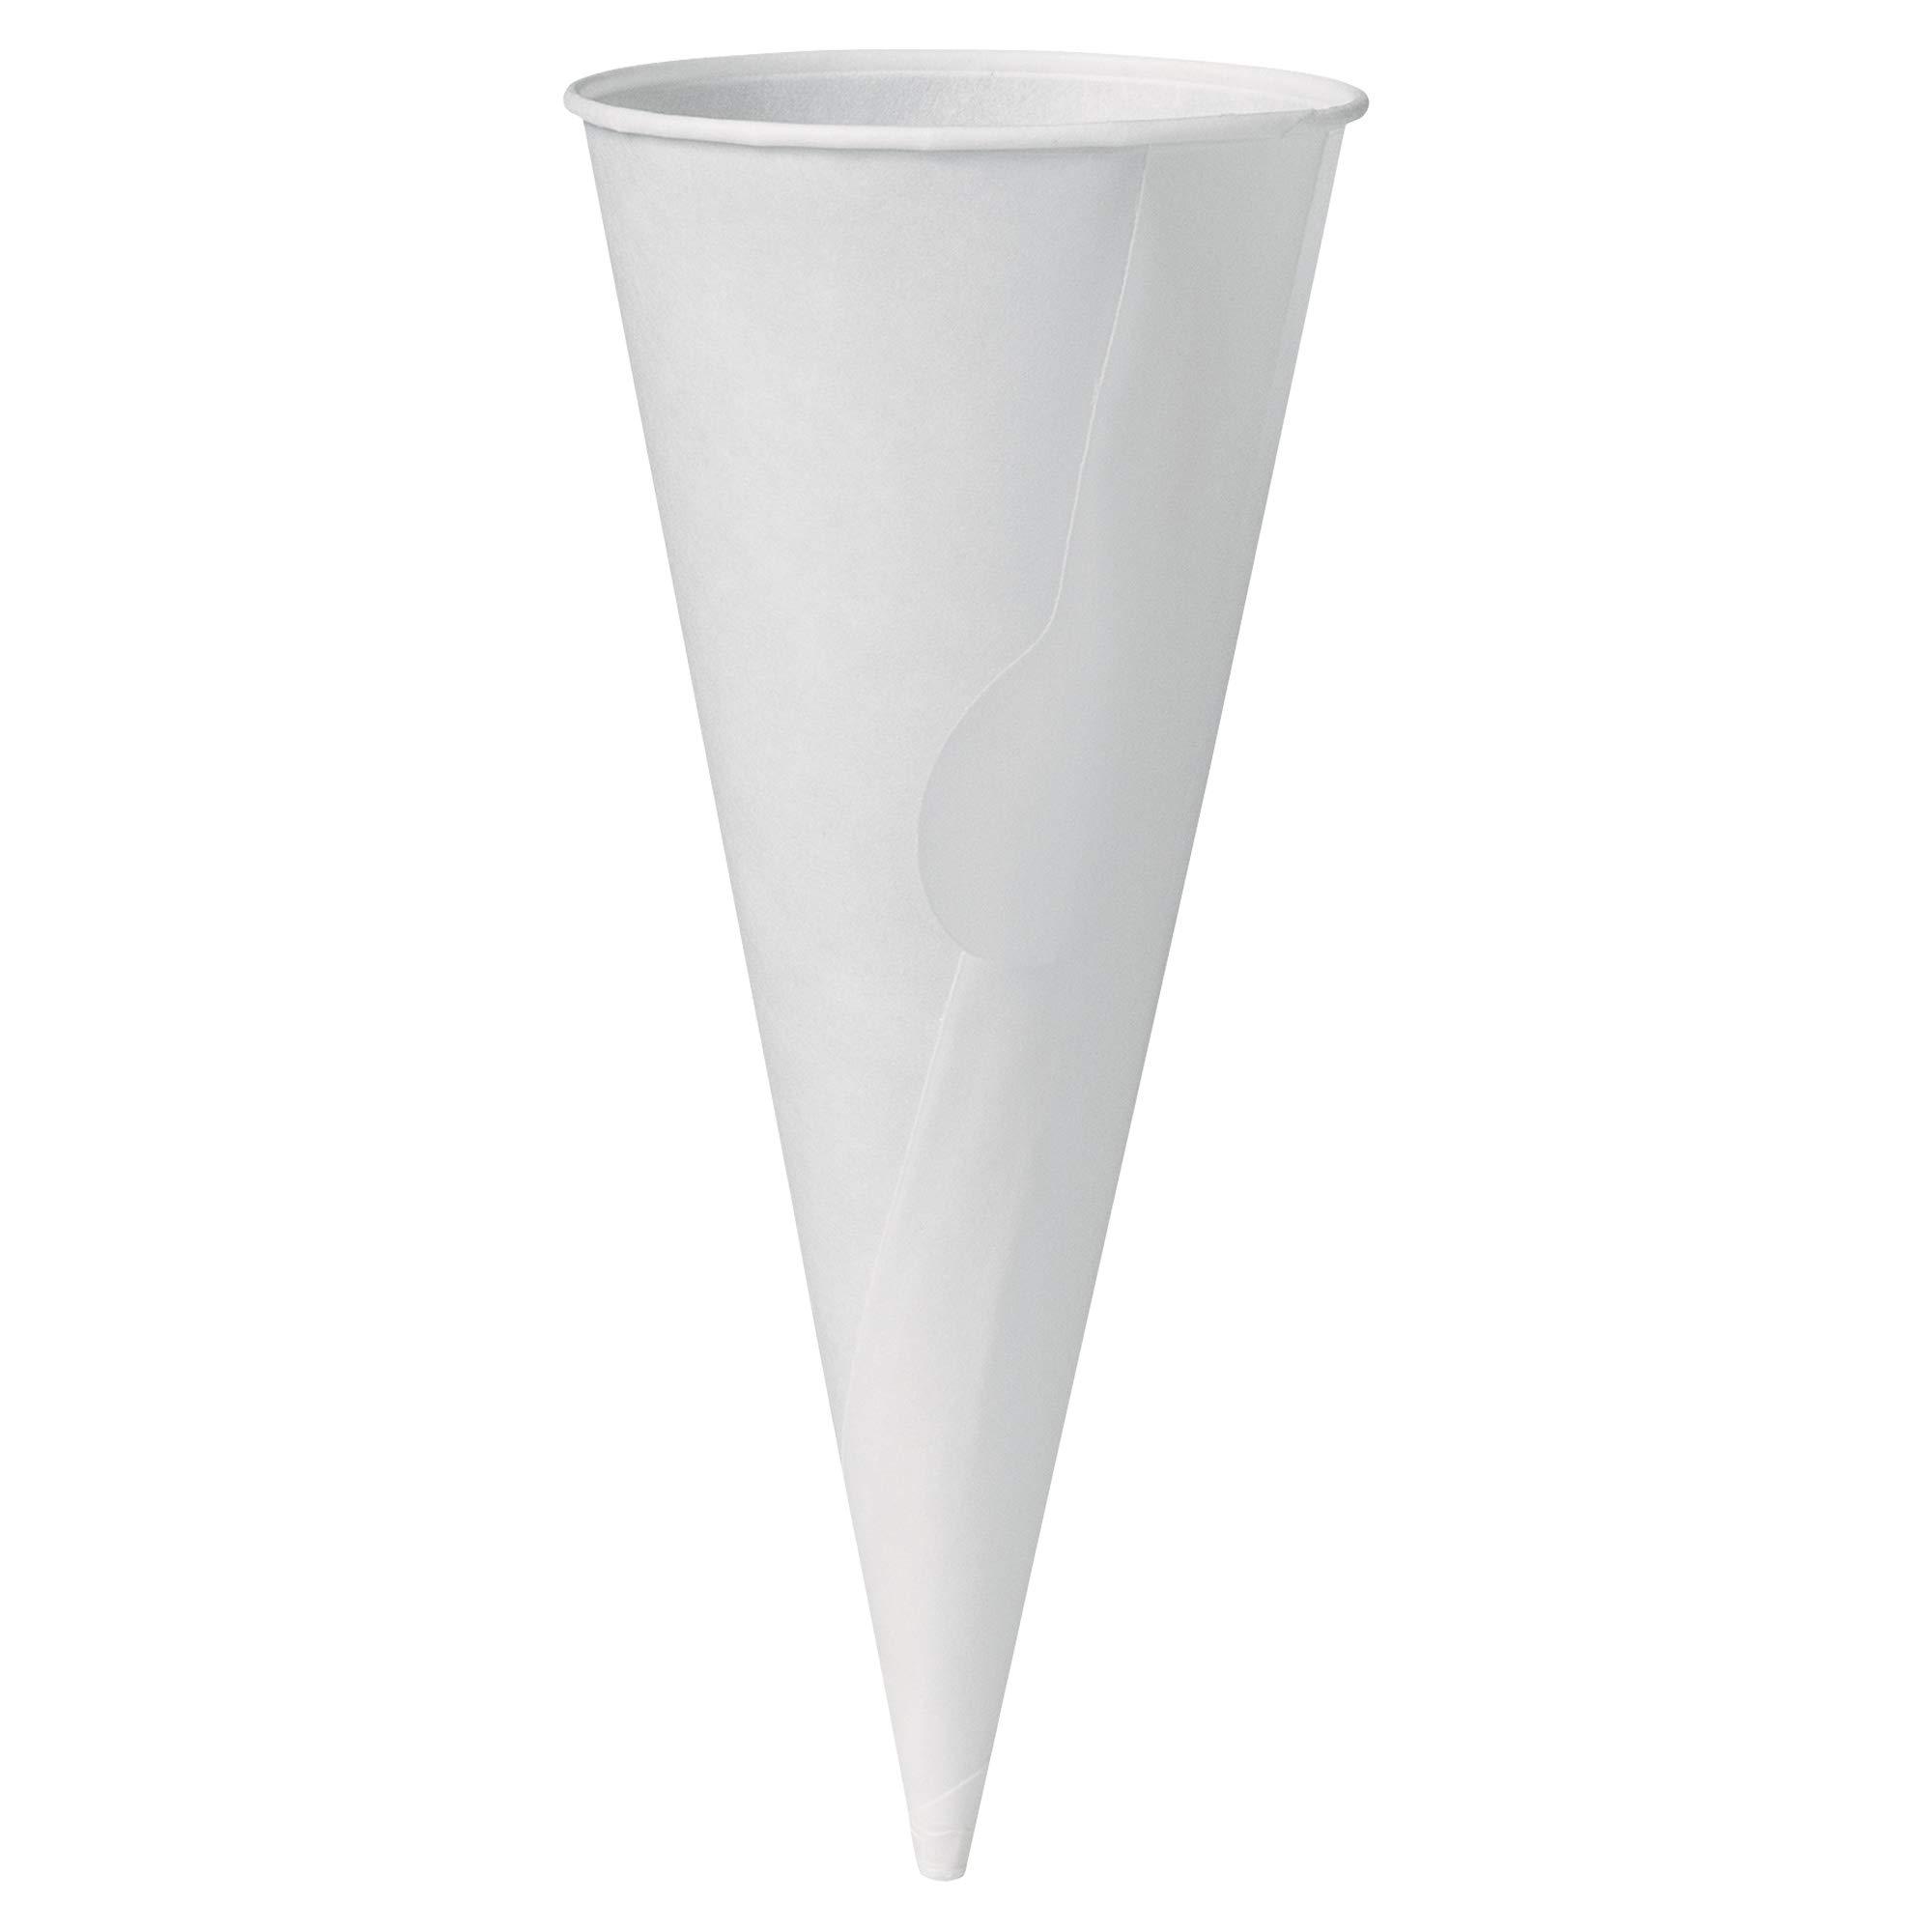 Solo 904R-2050 4 oz White Paper Cone Jacket (Case of 6000)